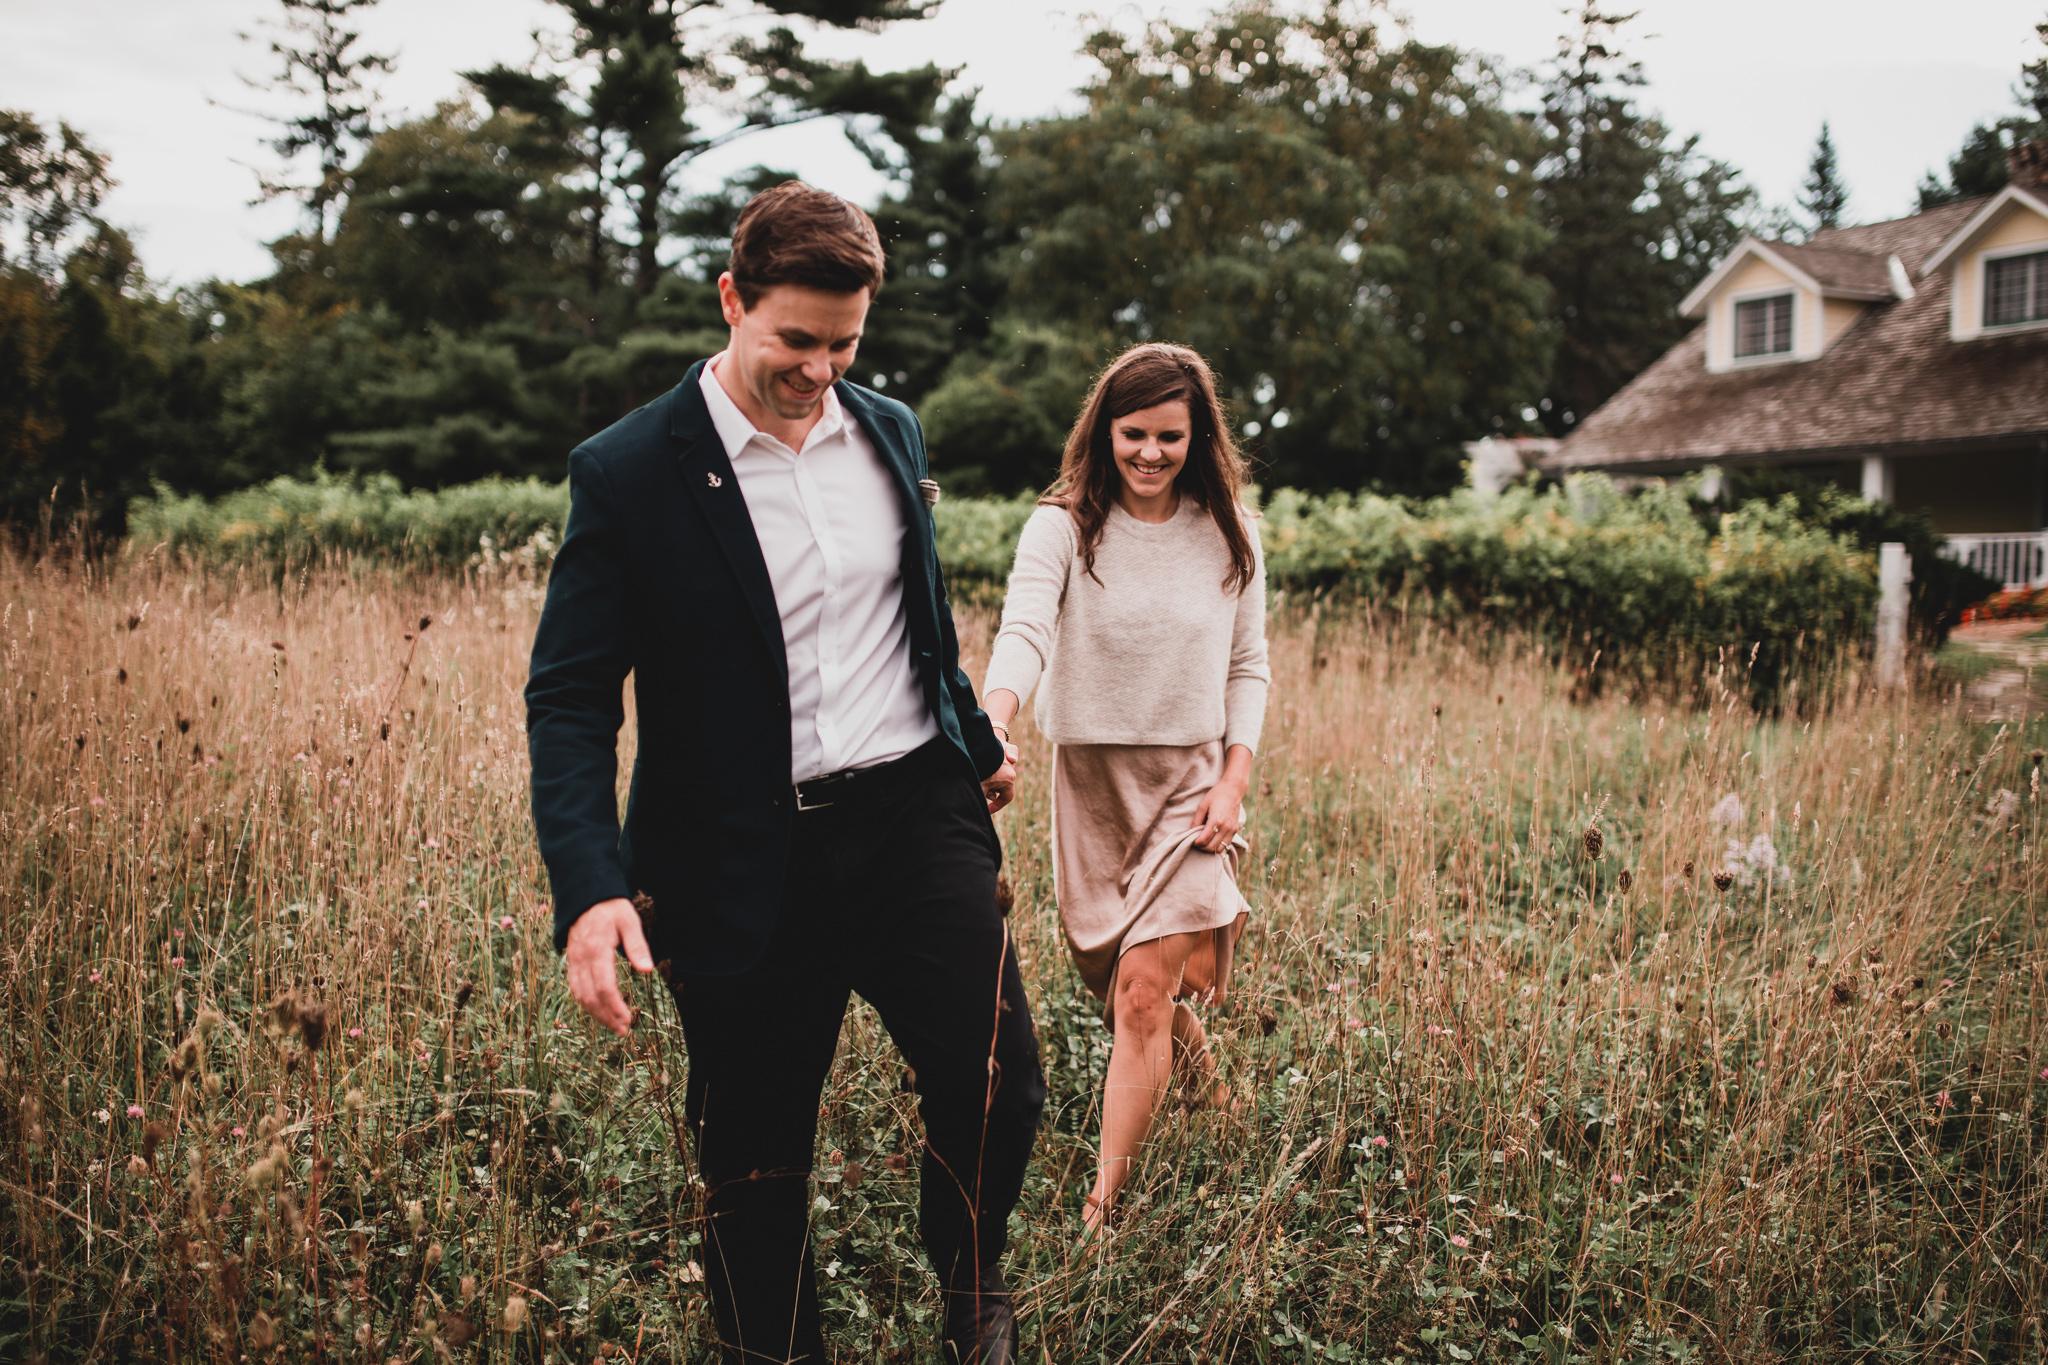 105-WEB-Jonathan-Kuhn-Photography-Amanda-Brennen-Engagement-6780.jpg